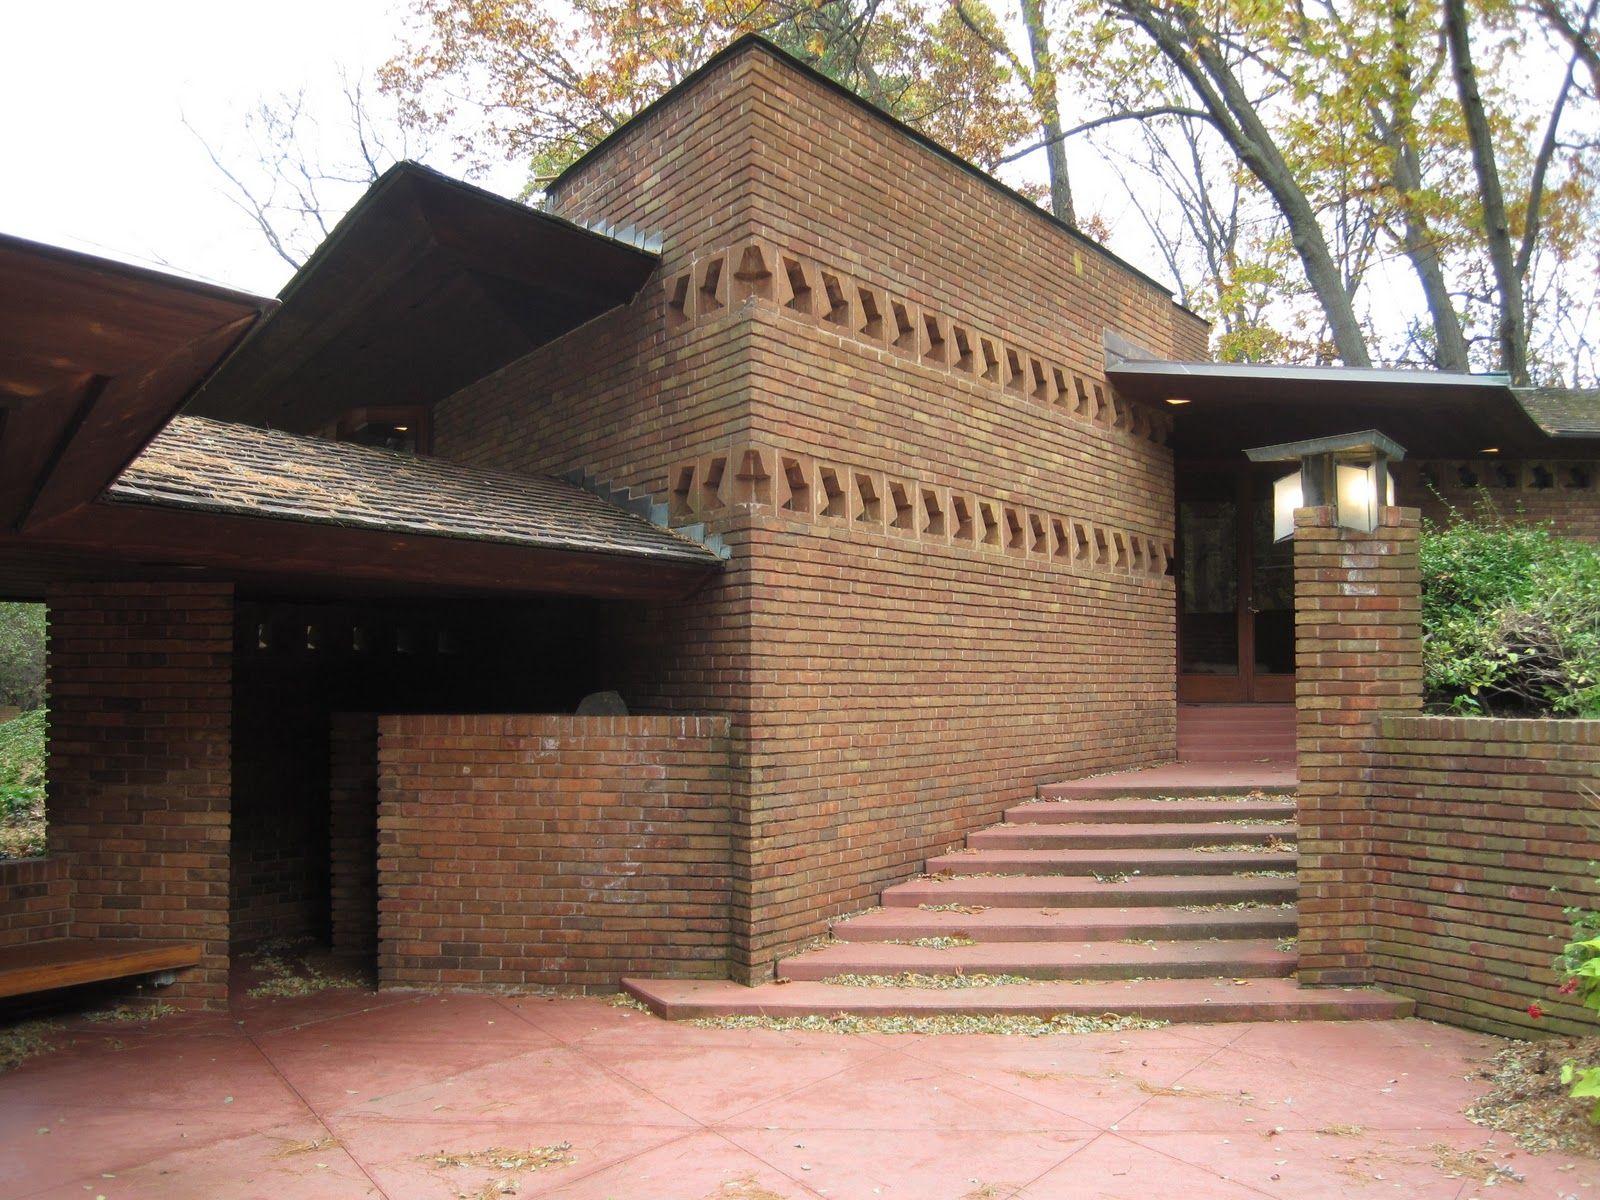 William And Mary Palmer House Ann Arbor Michigan Usonian Frank